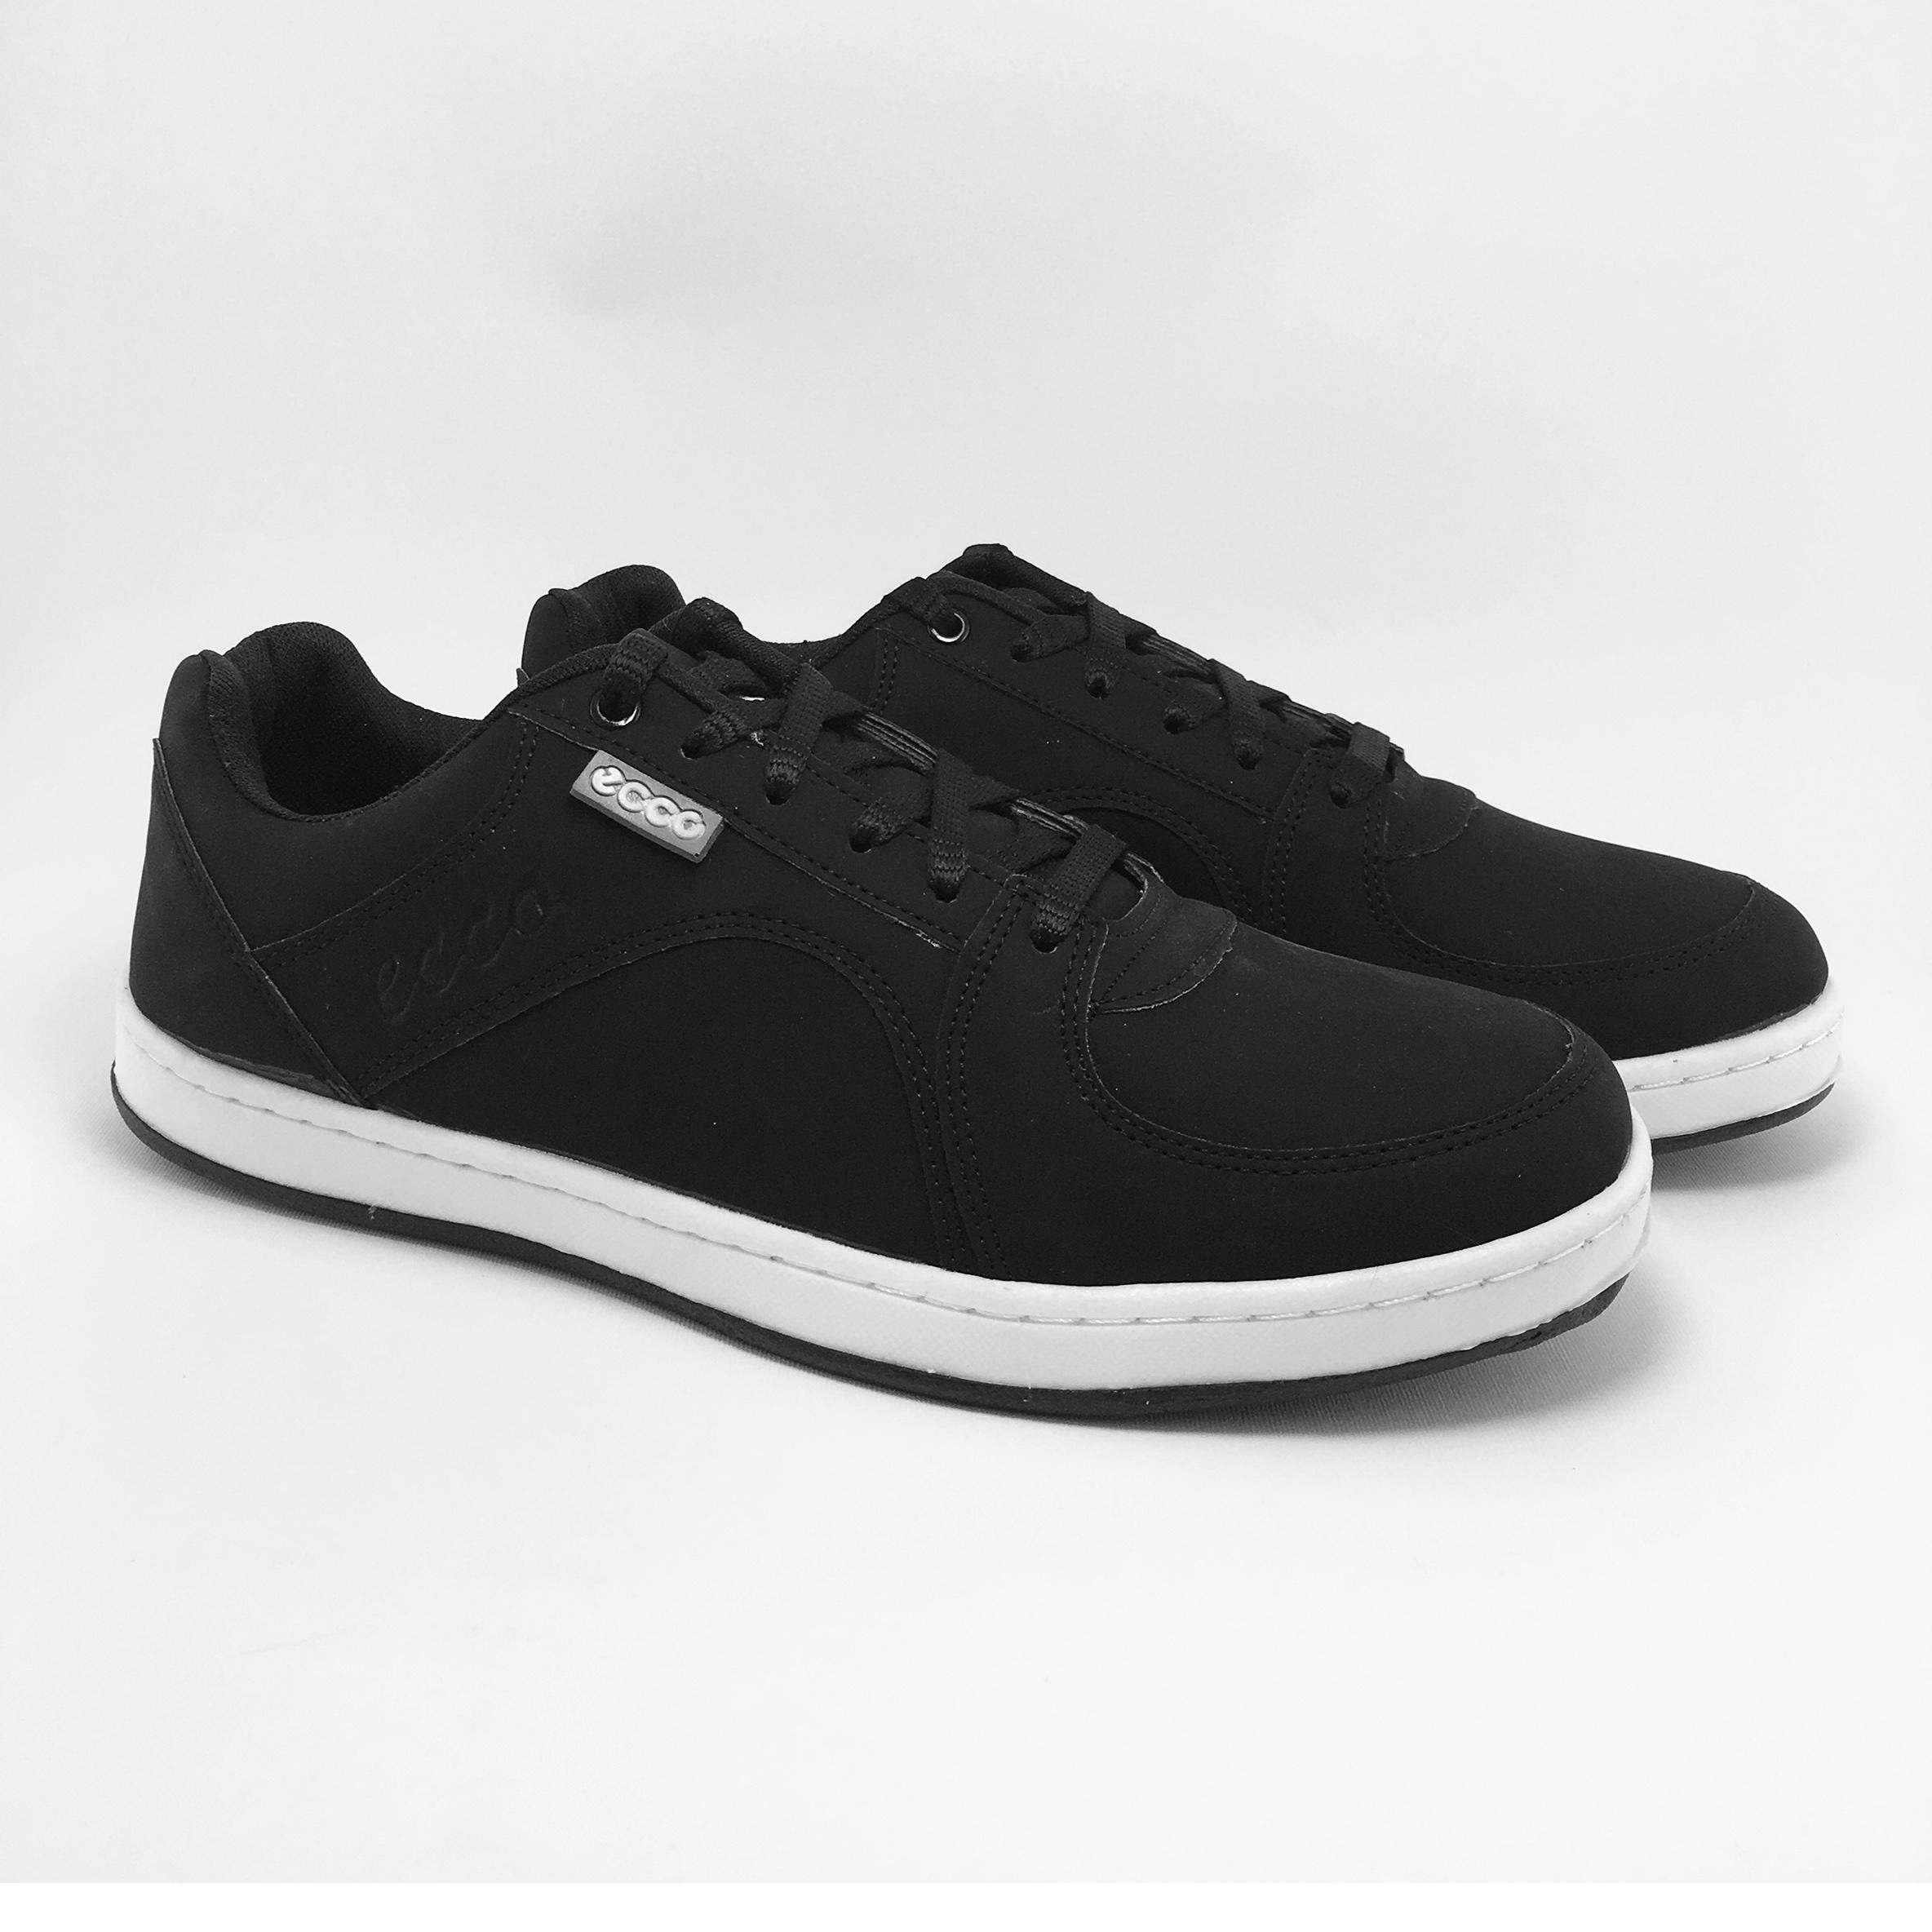 خرید                      کفش اسپورت مردانه کد H21